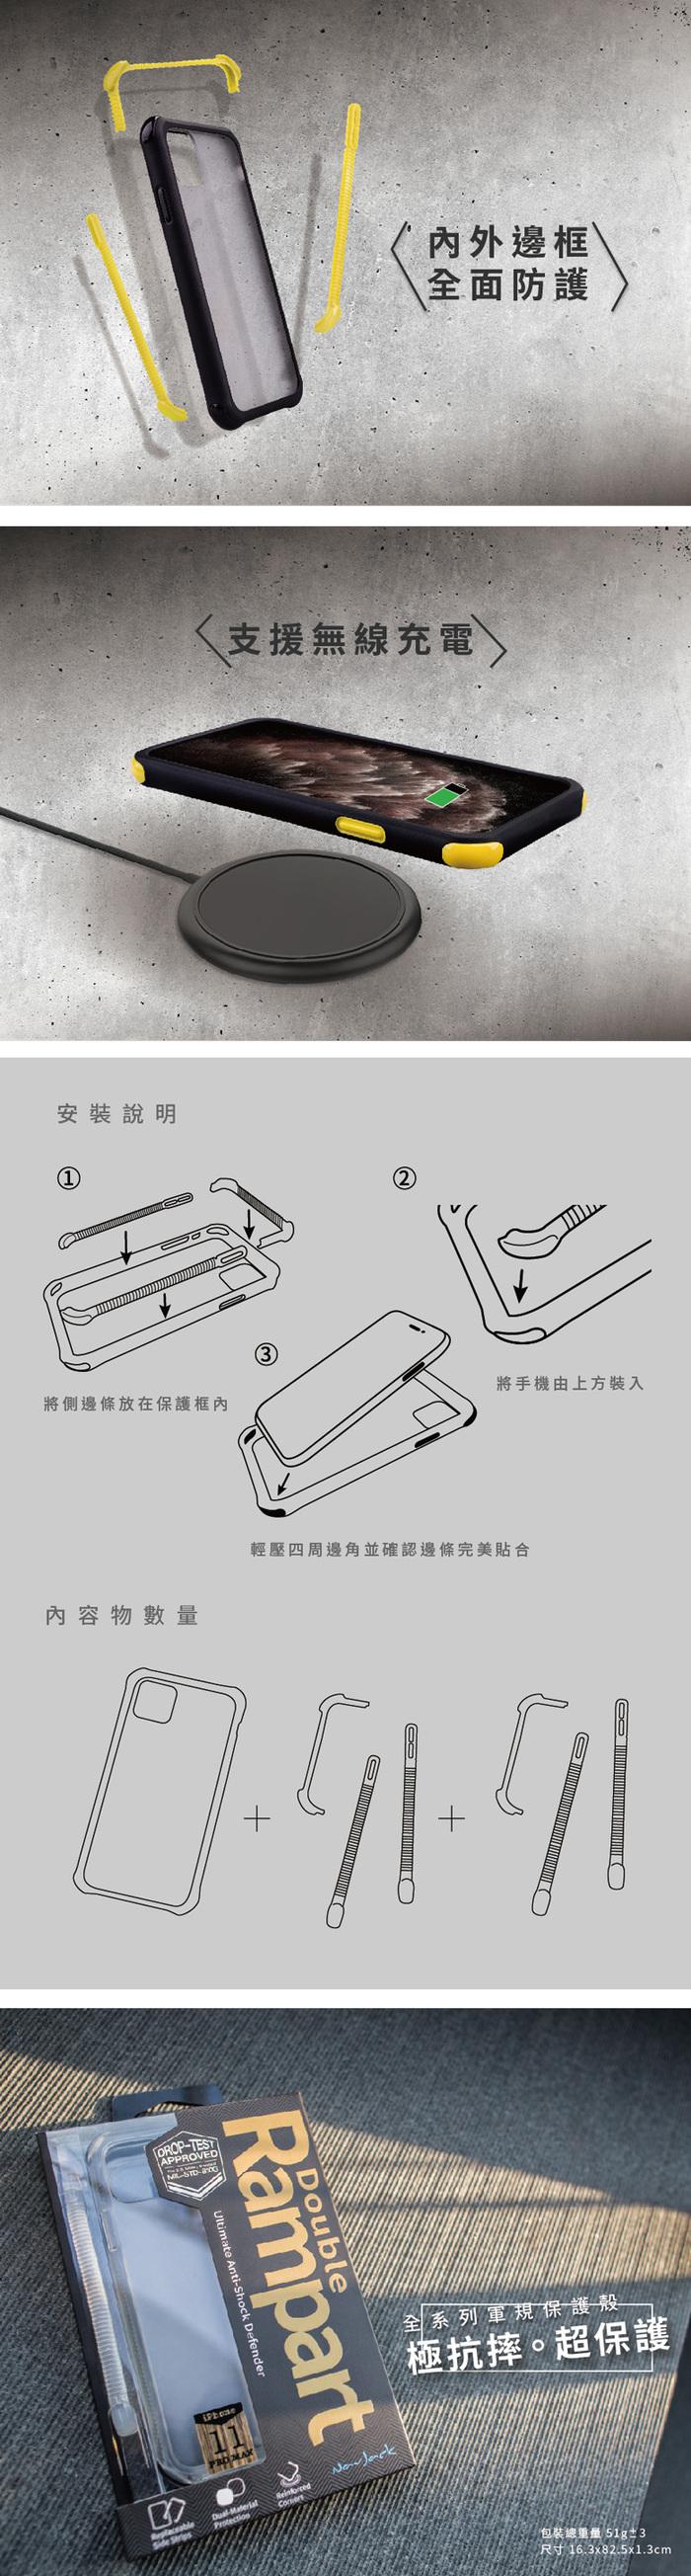 NavJack|iPhone 11 Pro (5.8吋) 雙重堡壘抗摔保護殼